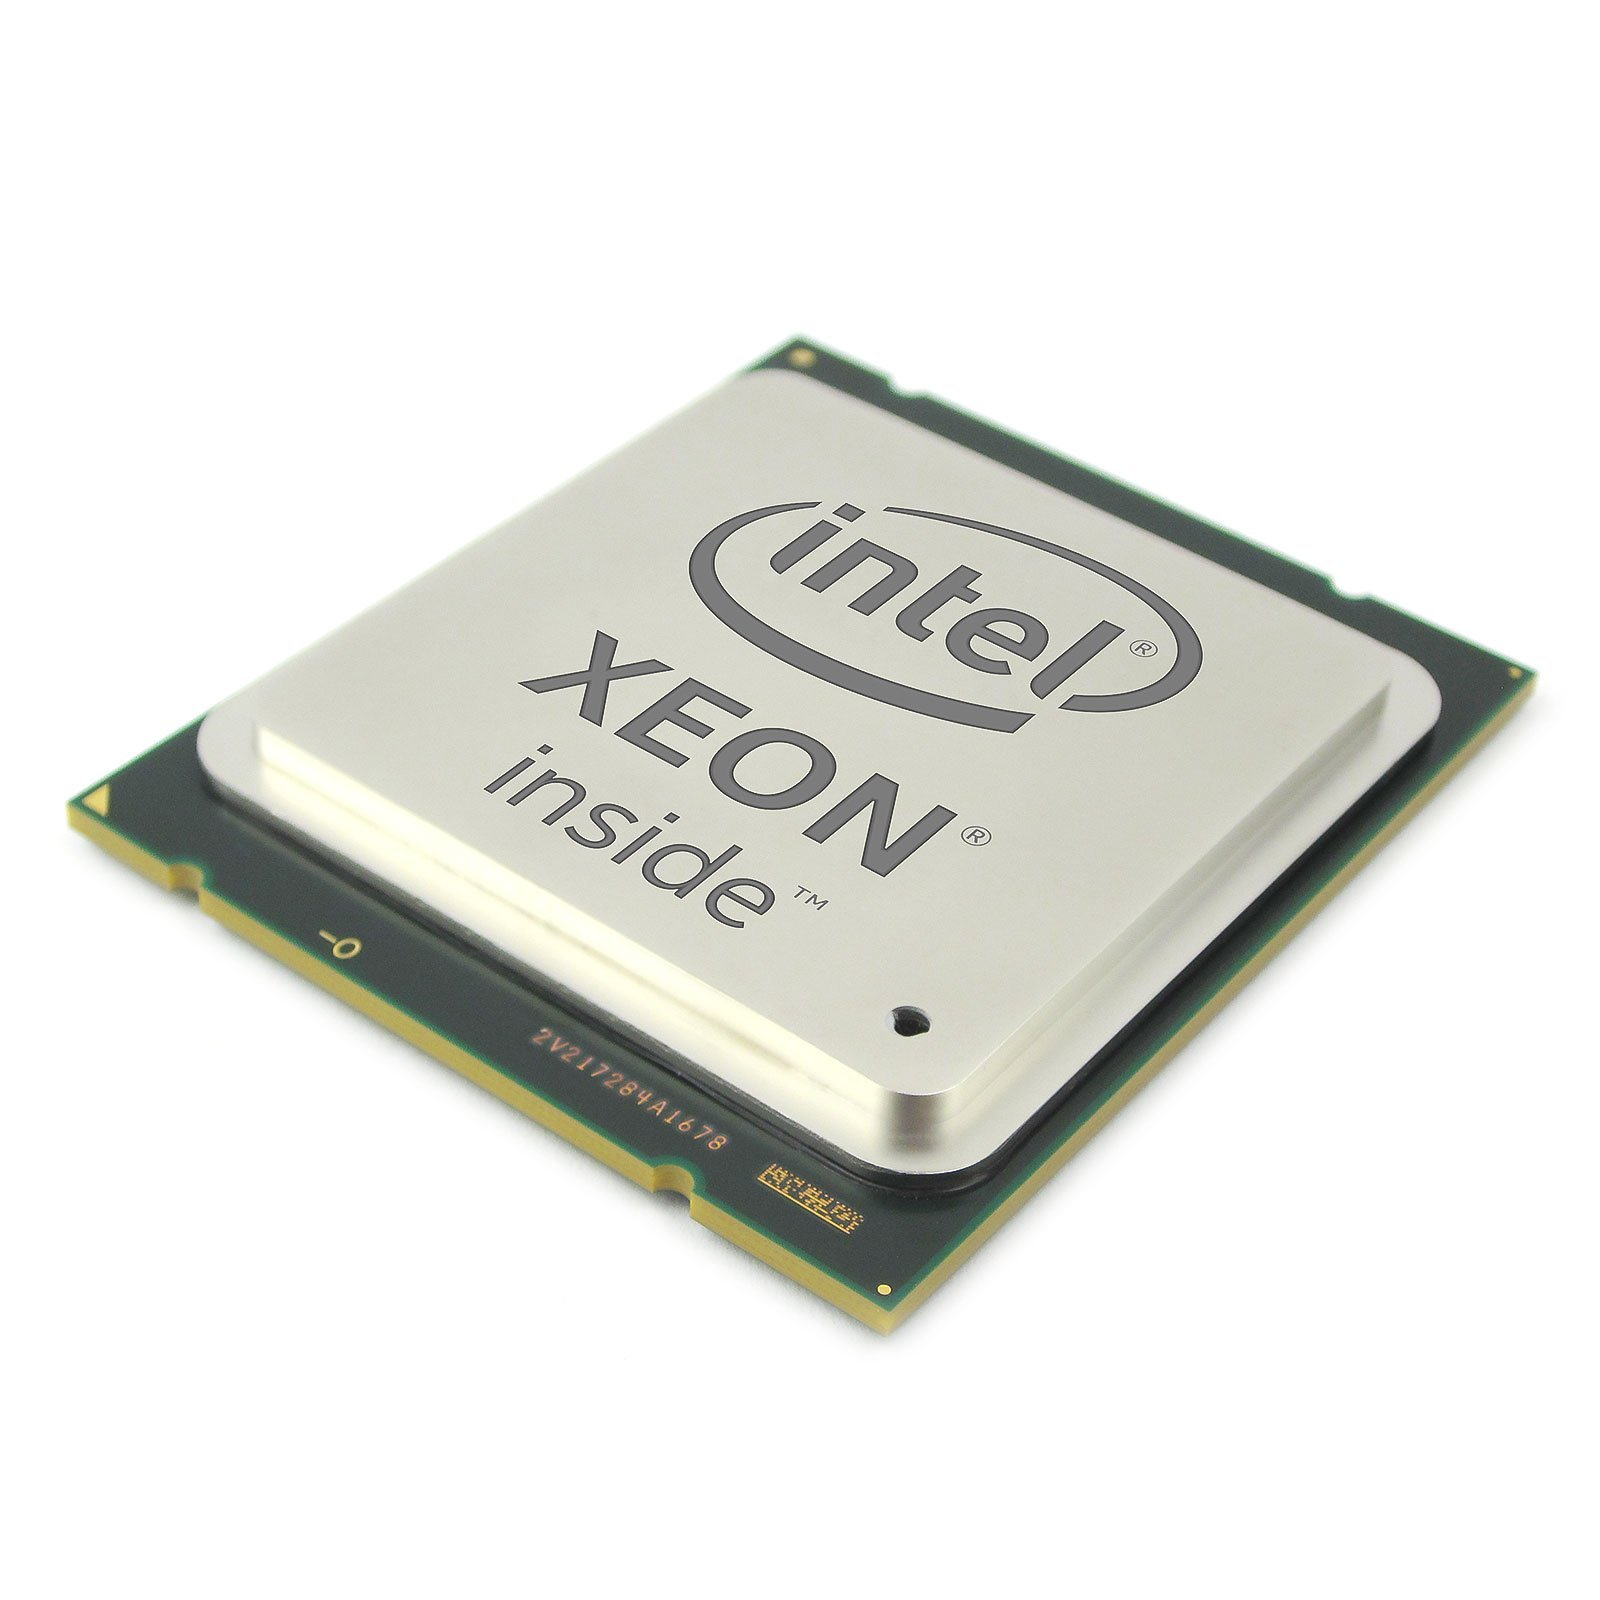 Intel Xeon Processor E7-4870 (2.40Ghz) (Certified Refurbished) by Intel